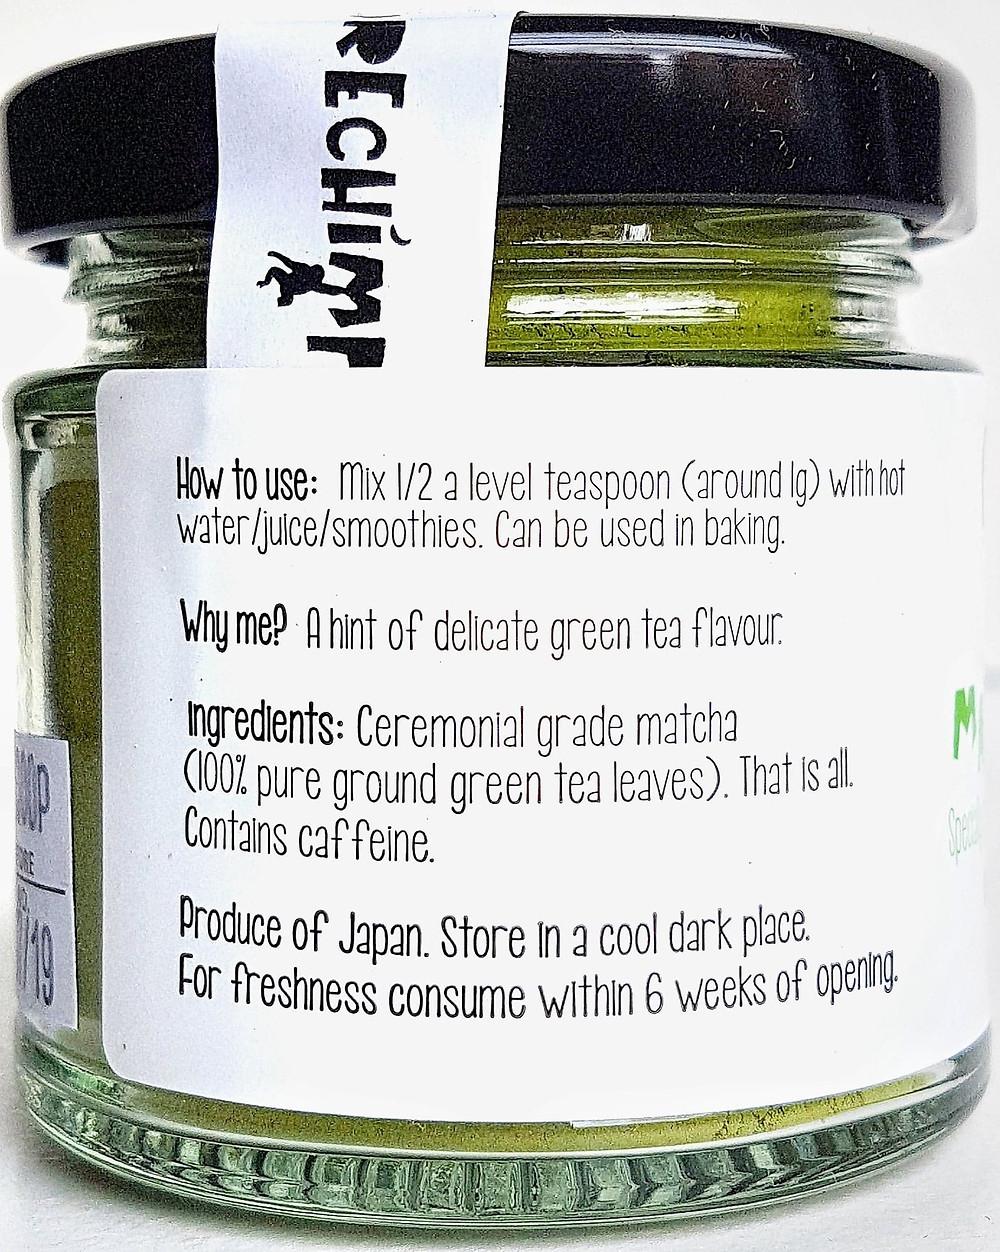 Pure Chimp Matcha Green Tea Ingredients